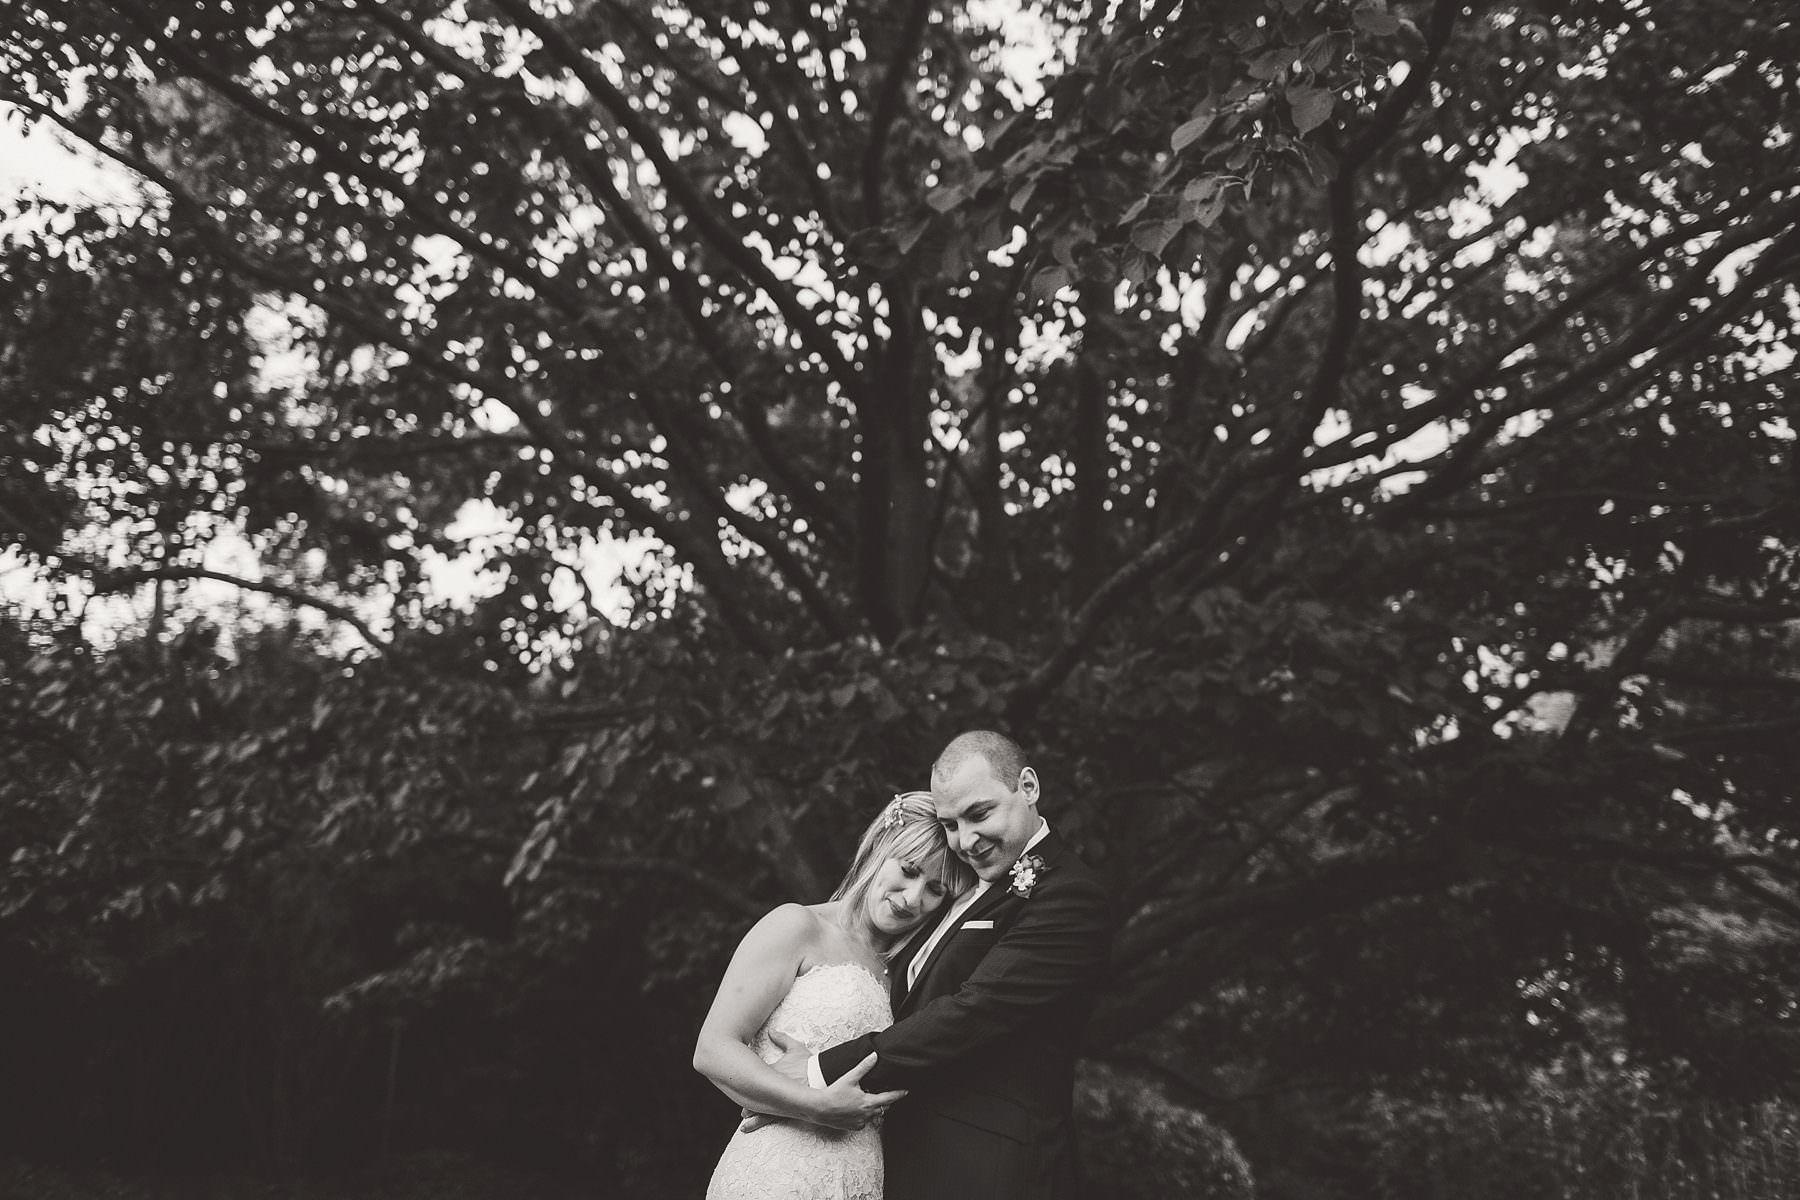 weddings-at-bristol-zoo-043